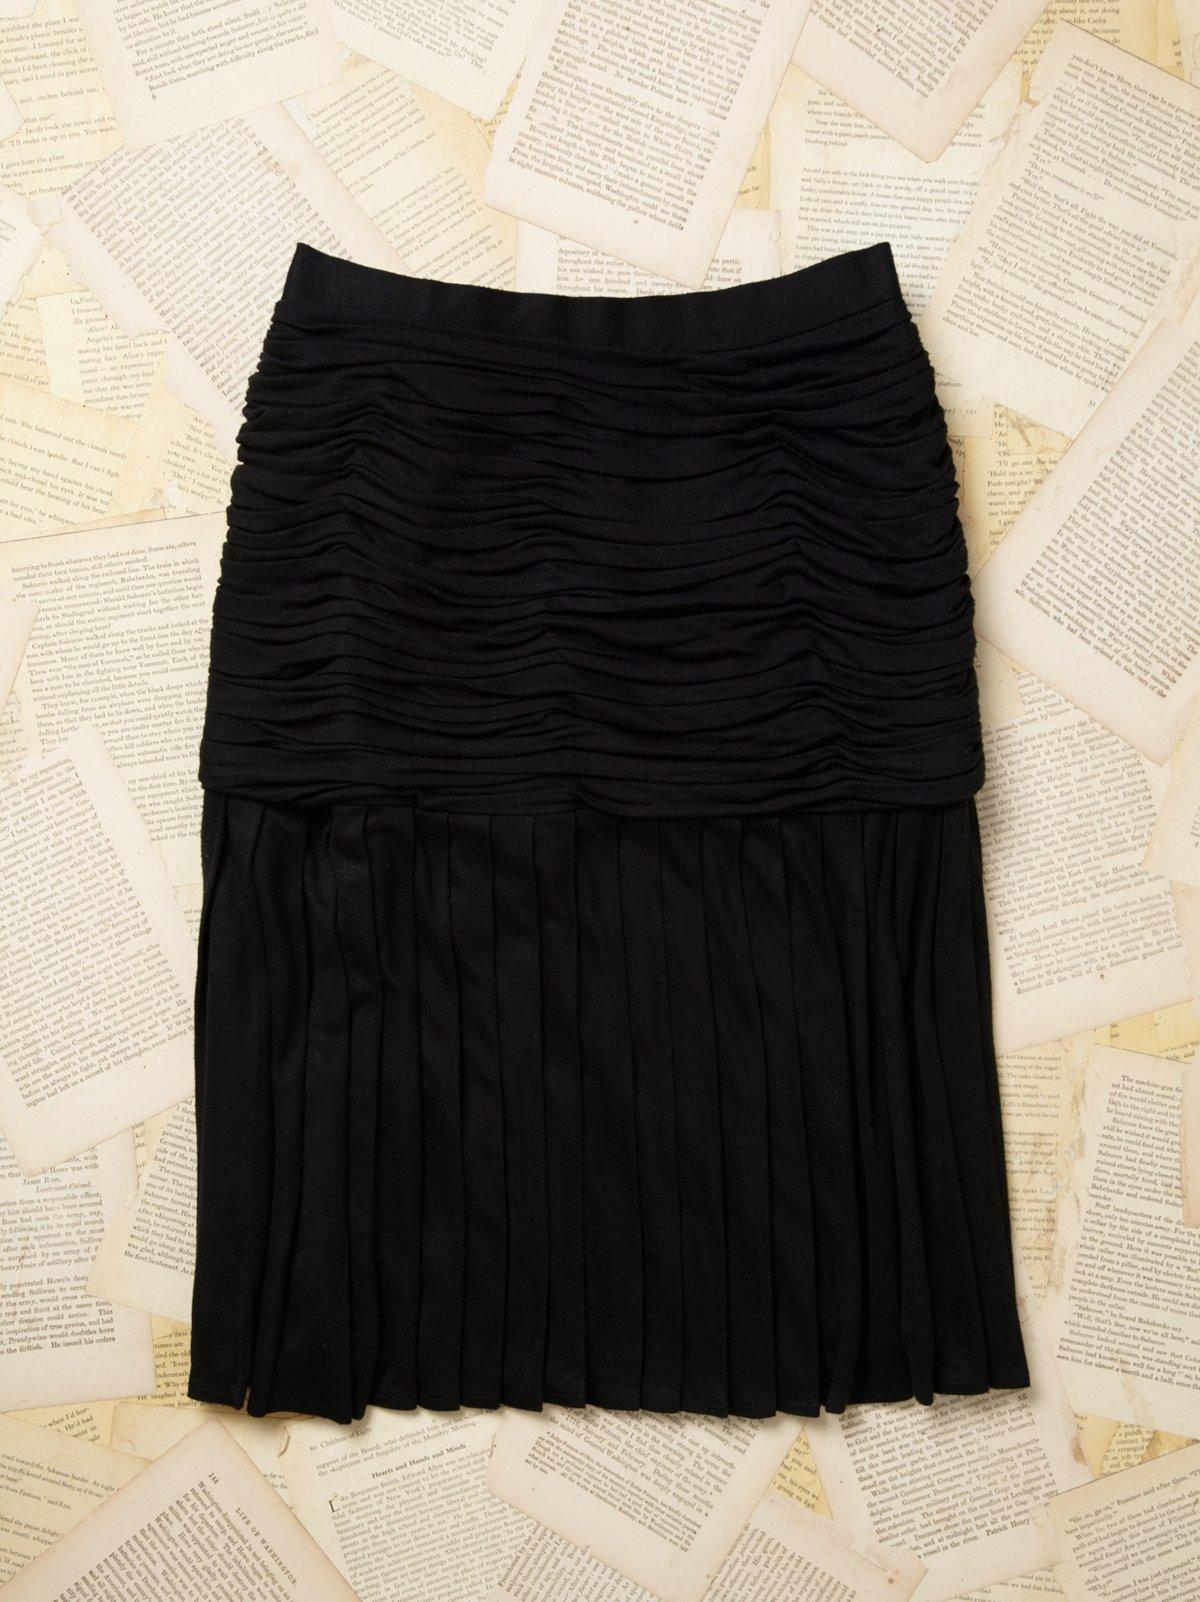 Vintage 1980s Oscar De La Renta Skirt